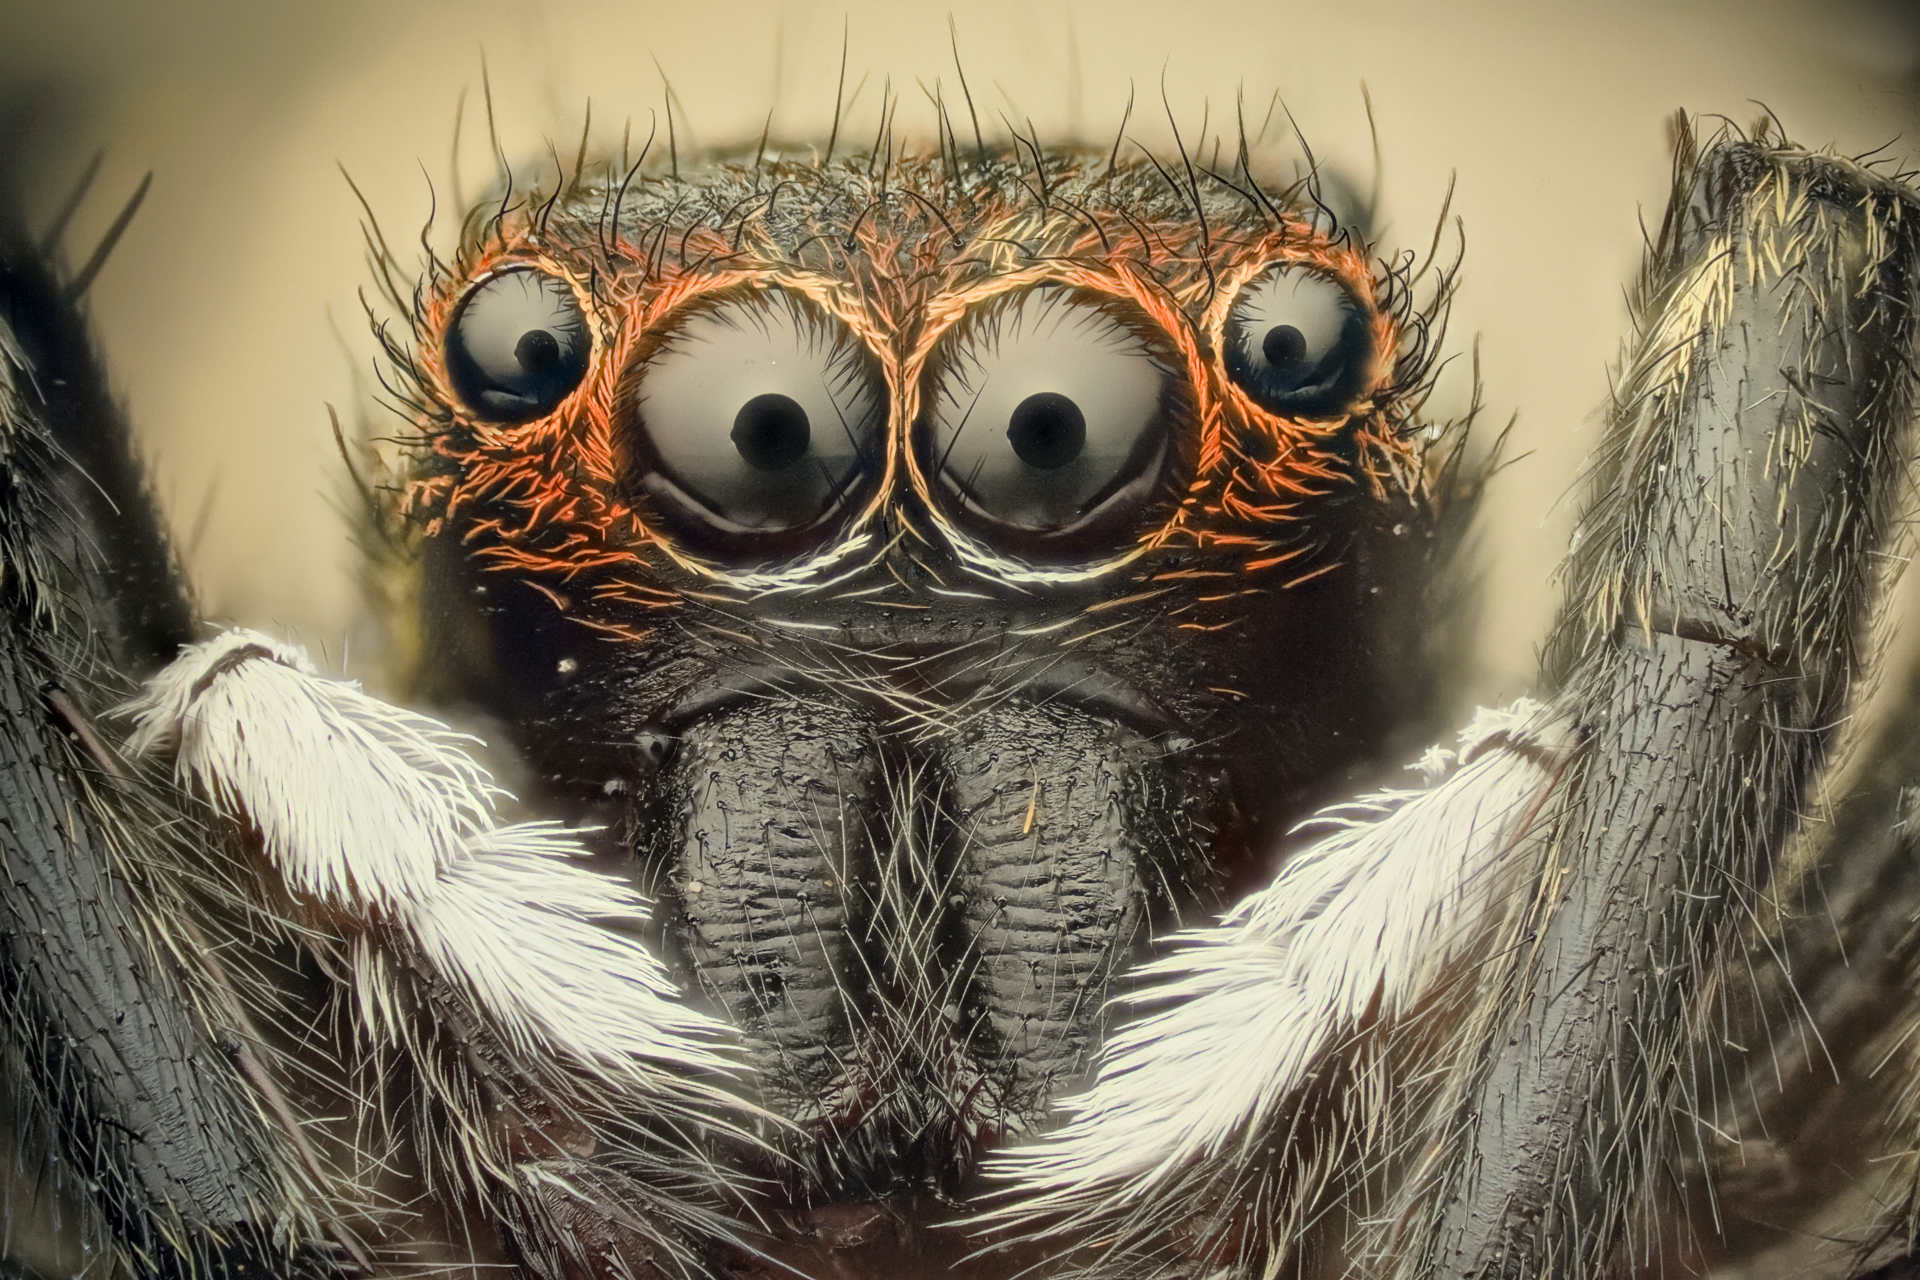 Spiders Wallpaper 1920x1280 Spiders 1920x1280